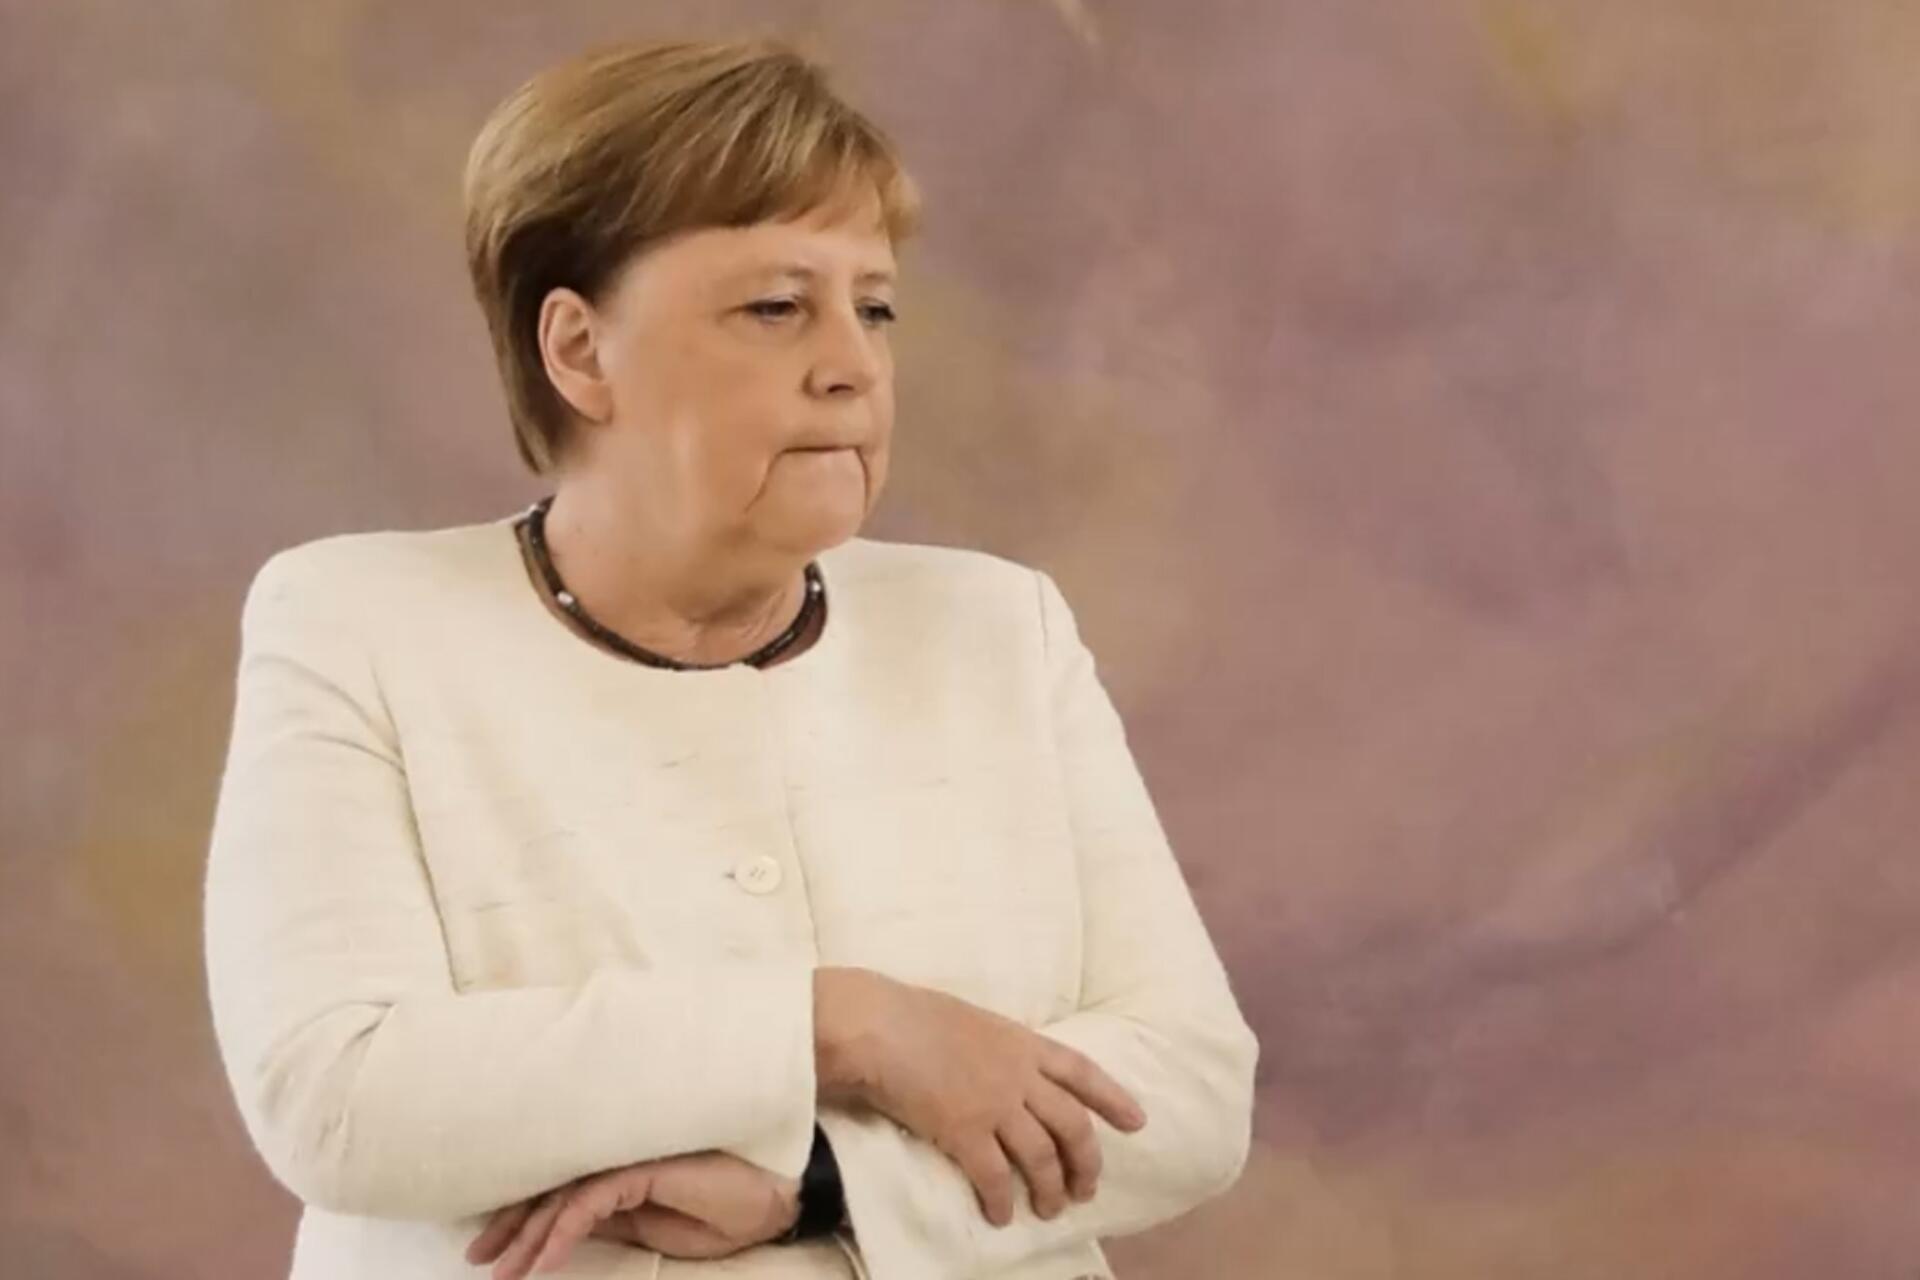 Bild zu Angela Merkel, Bundeskanzlerin, Schloss Bellevue, Berlin